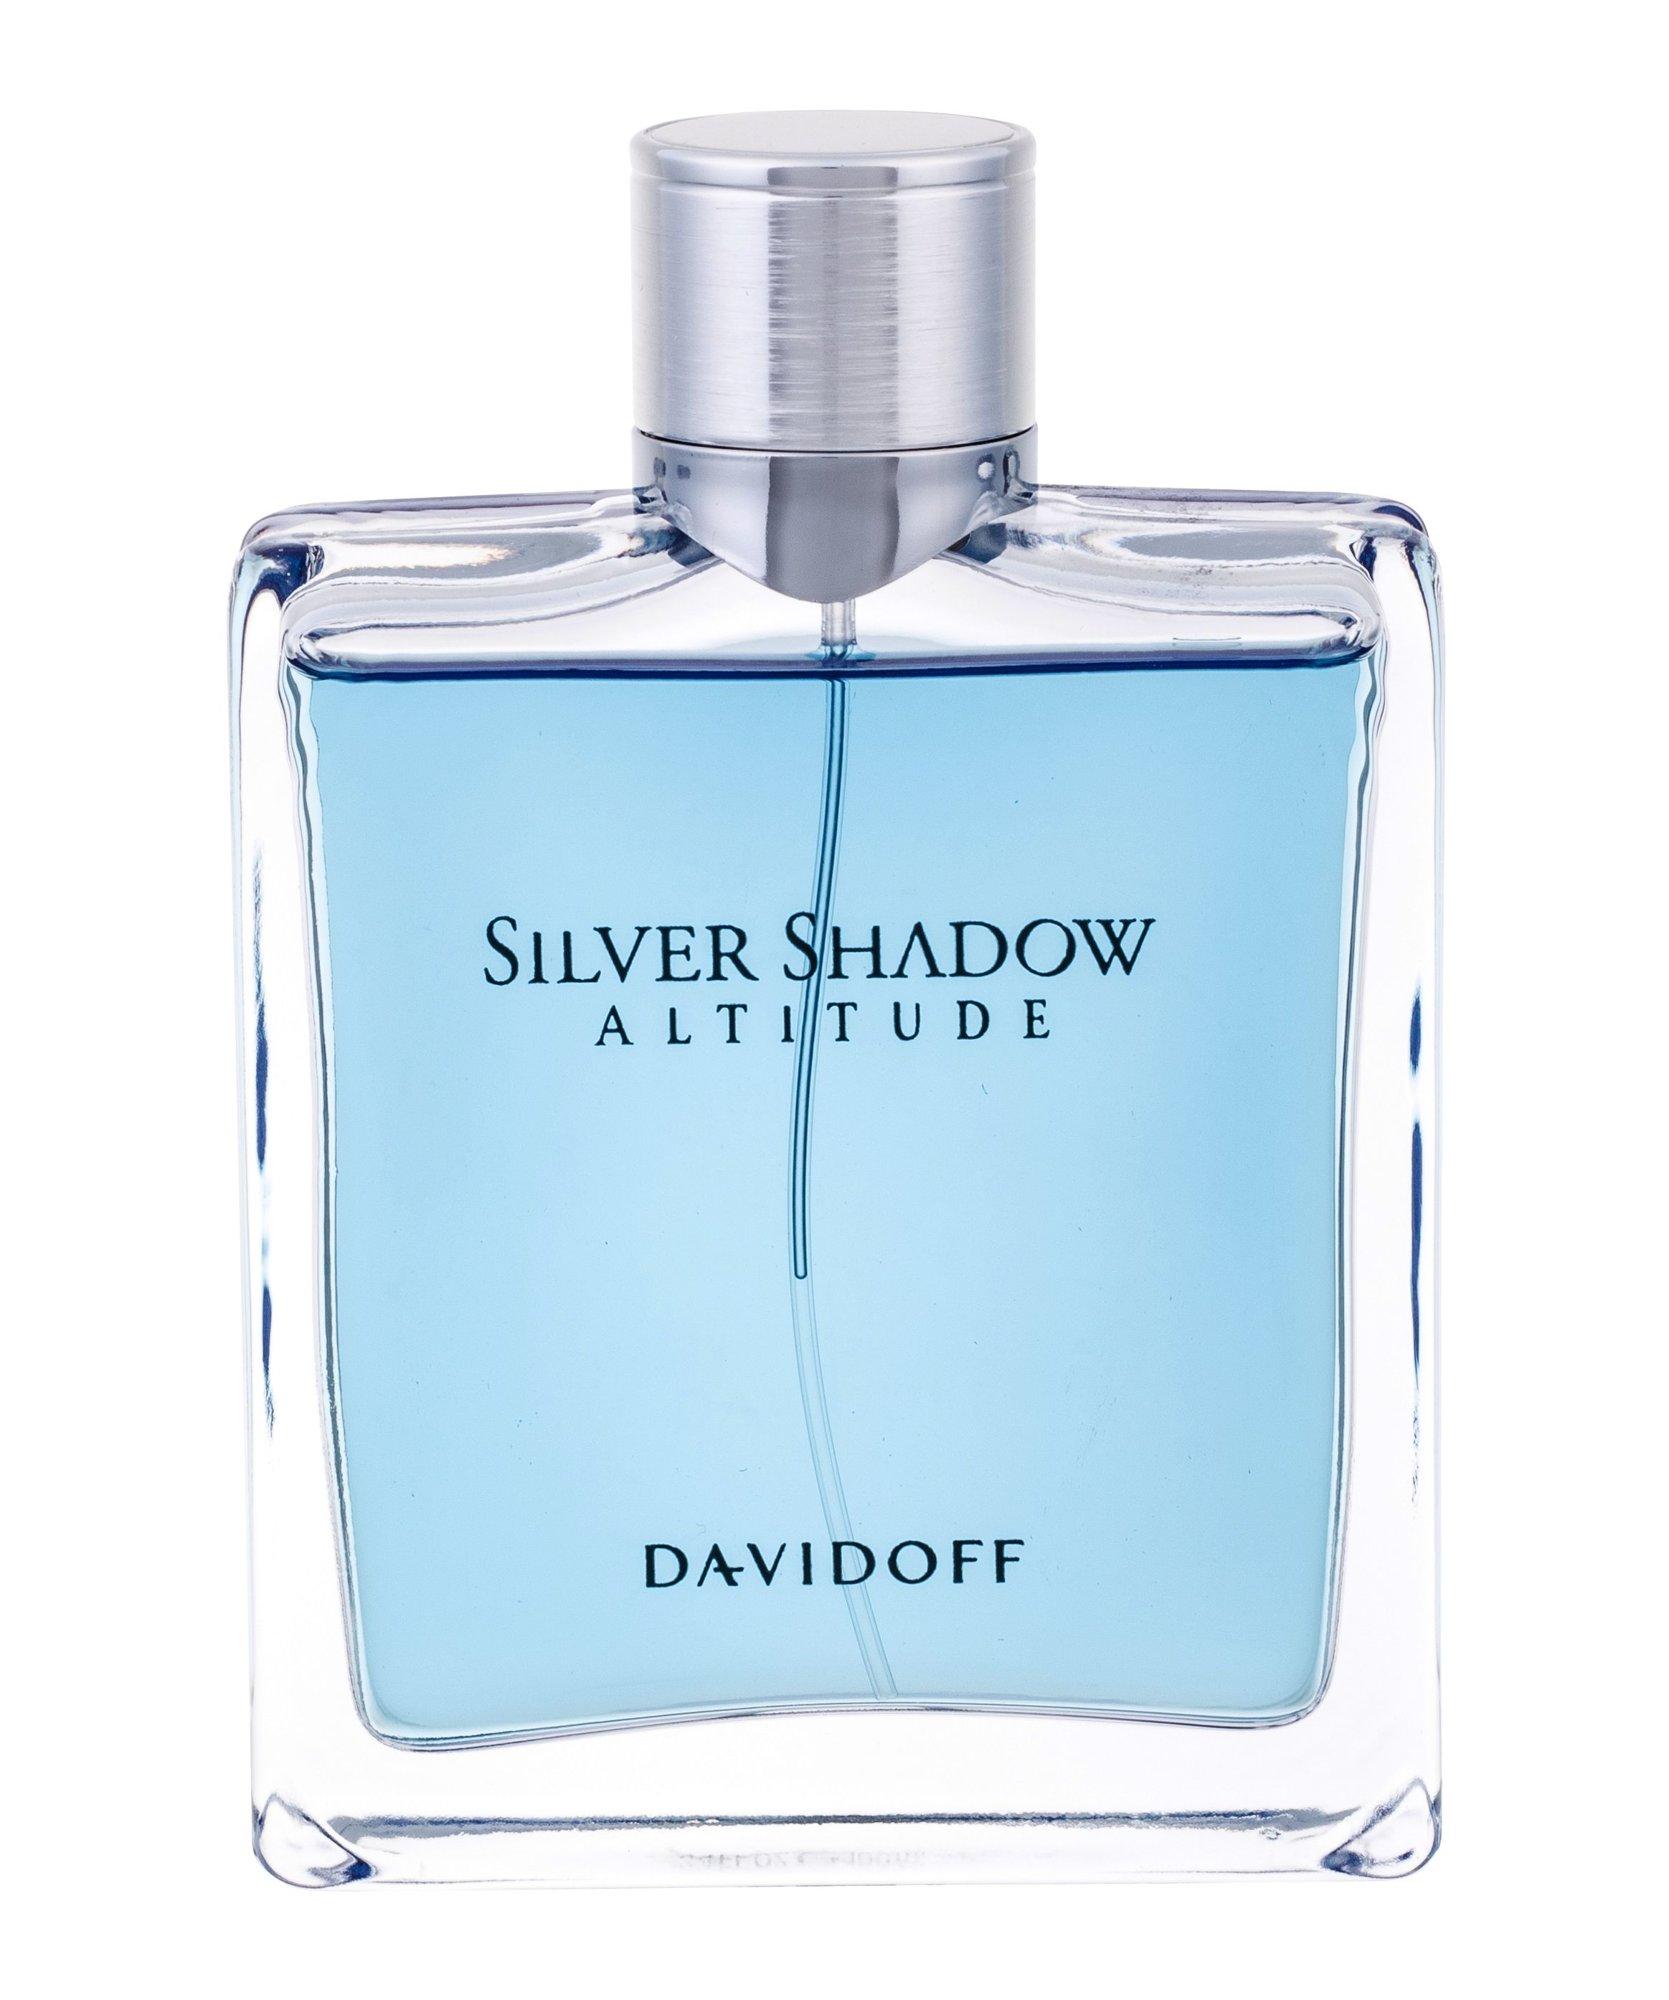 Davidoff Silver Shadow Altitude, edt 100ml